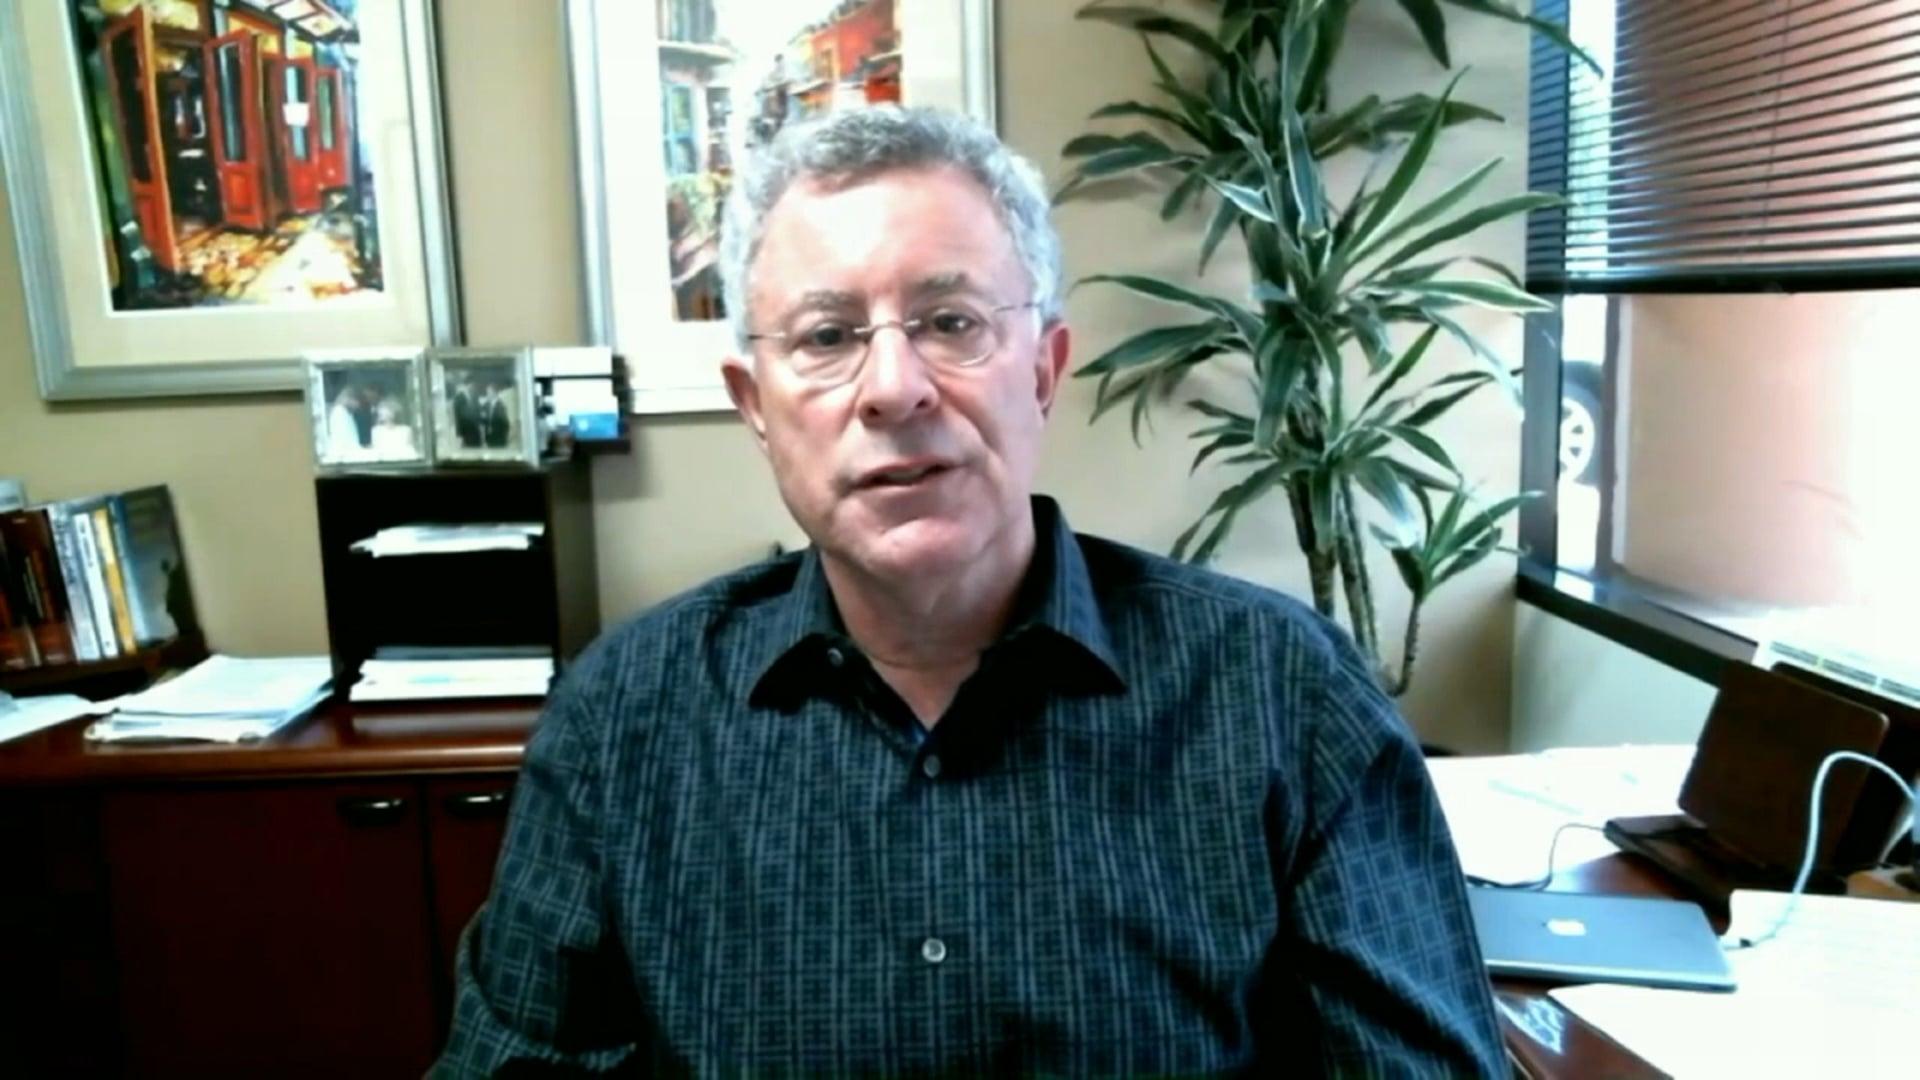 AHL Featured leader interview - Nate Kaufman